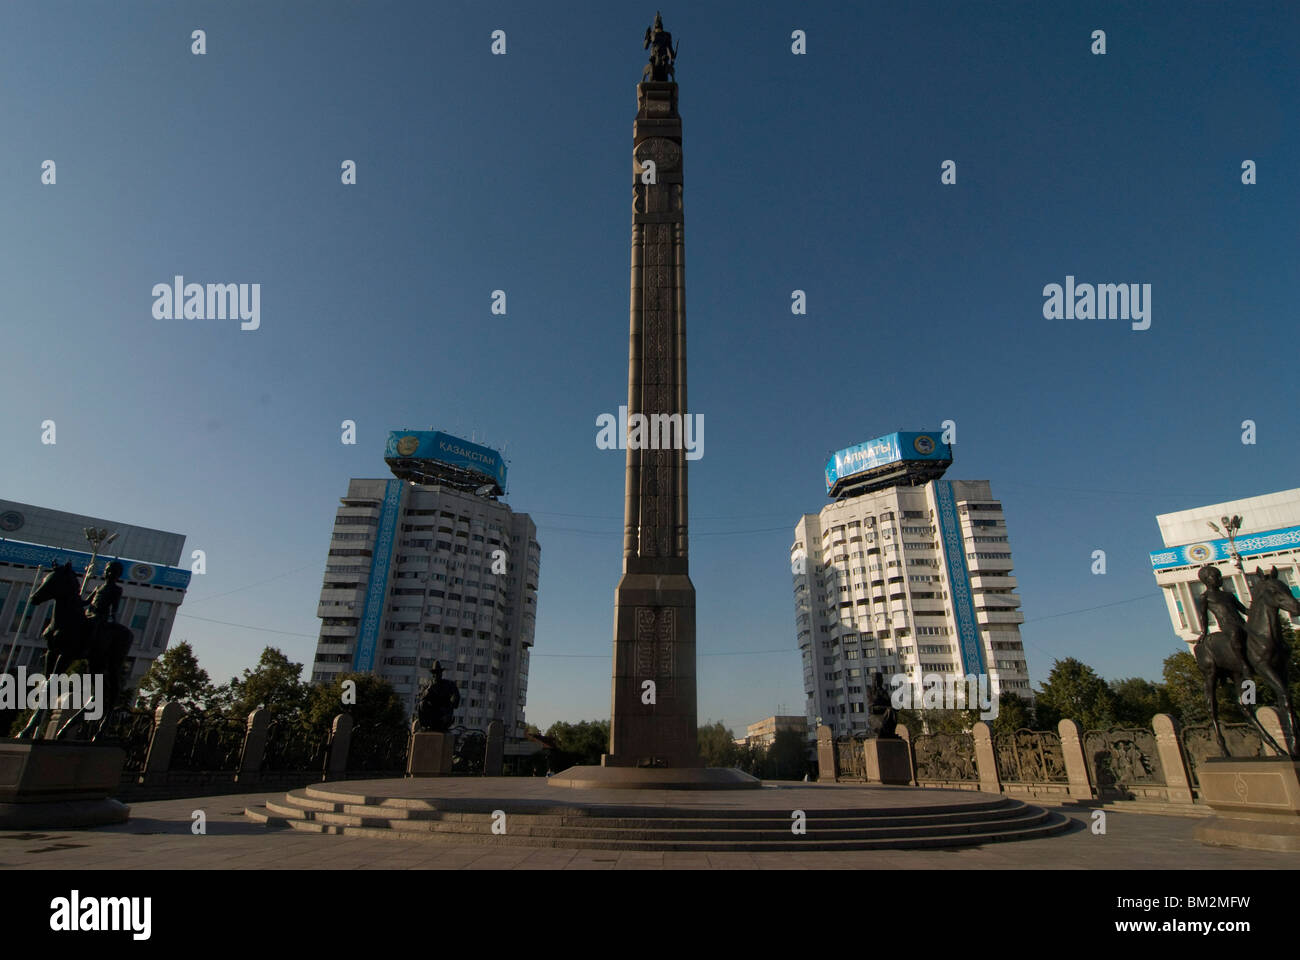 Monument der Unabhängigkeit Obelisk, Alma-Ata, Kasachstan Stockbild